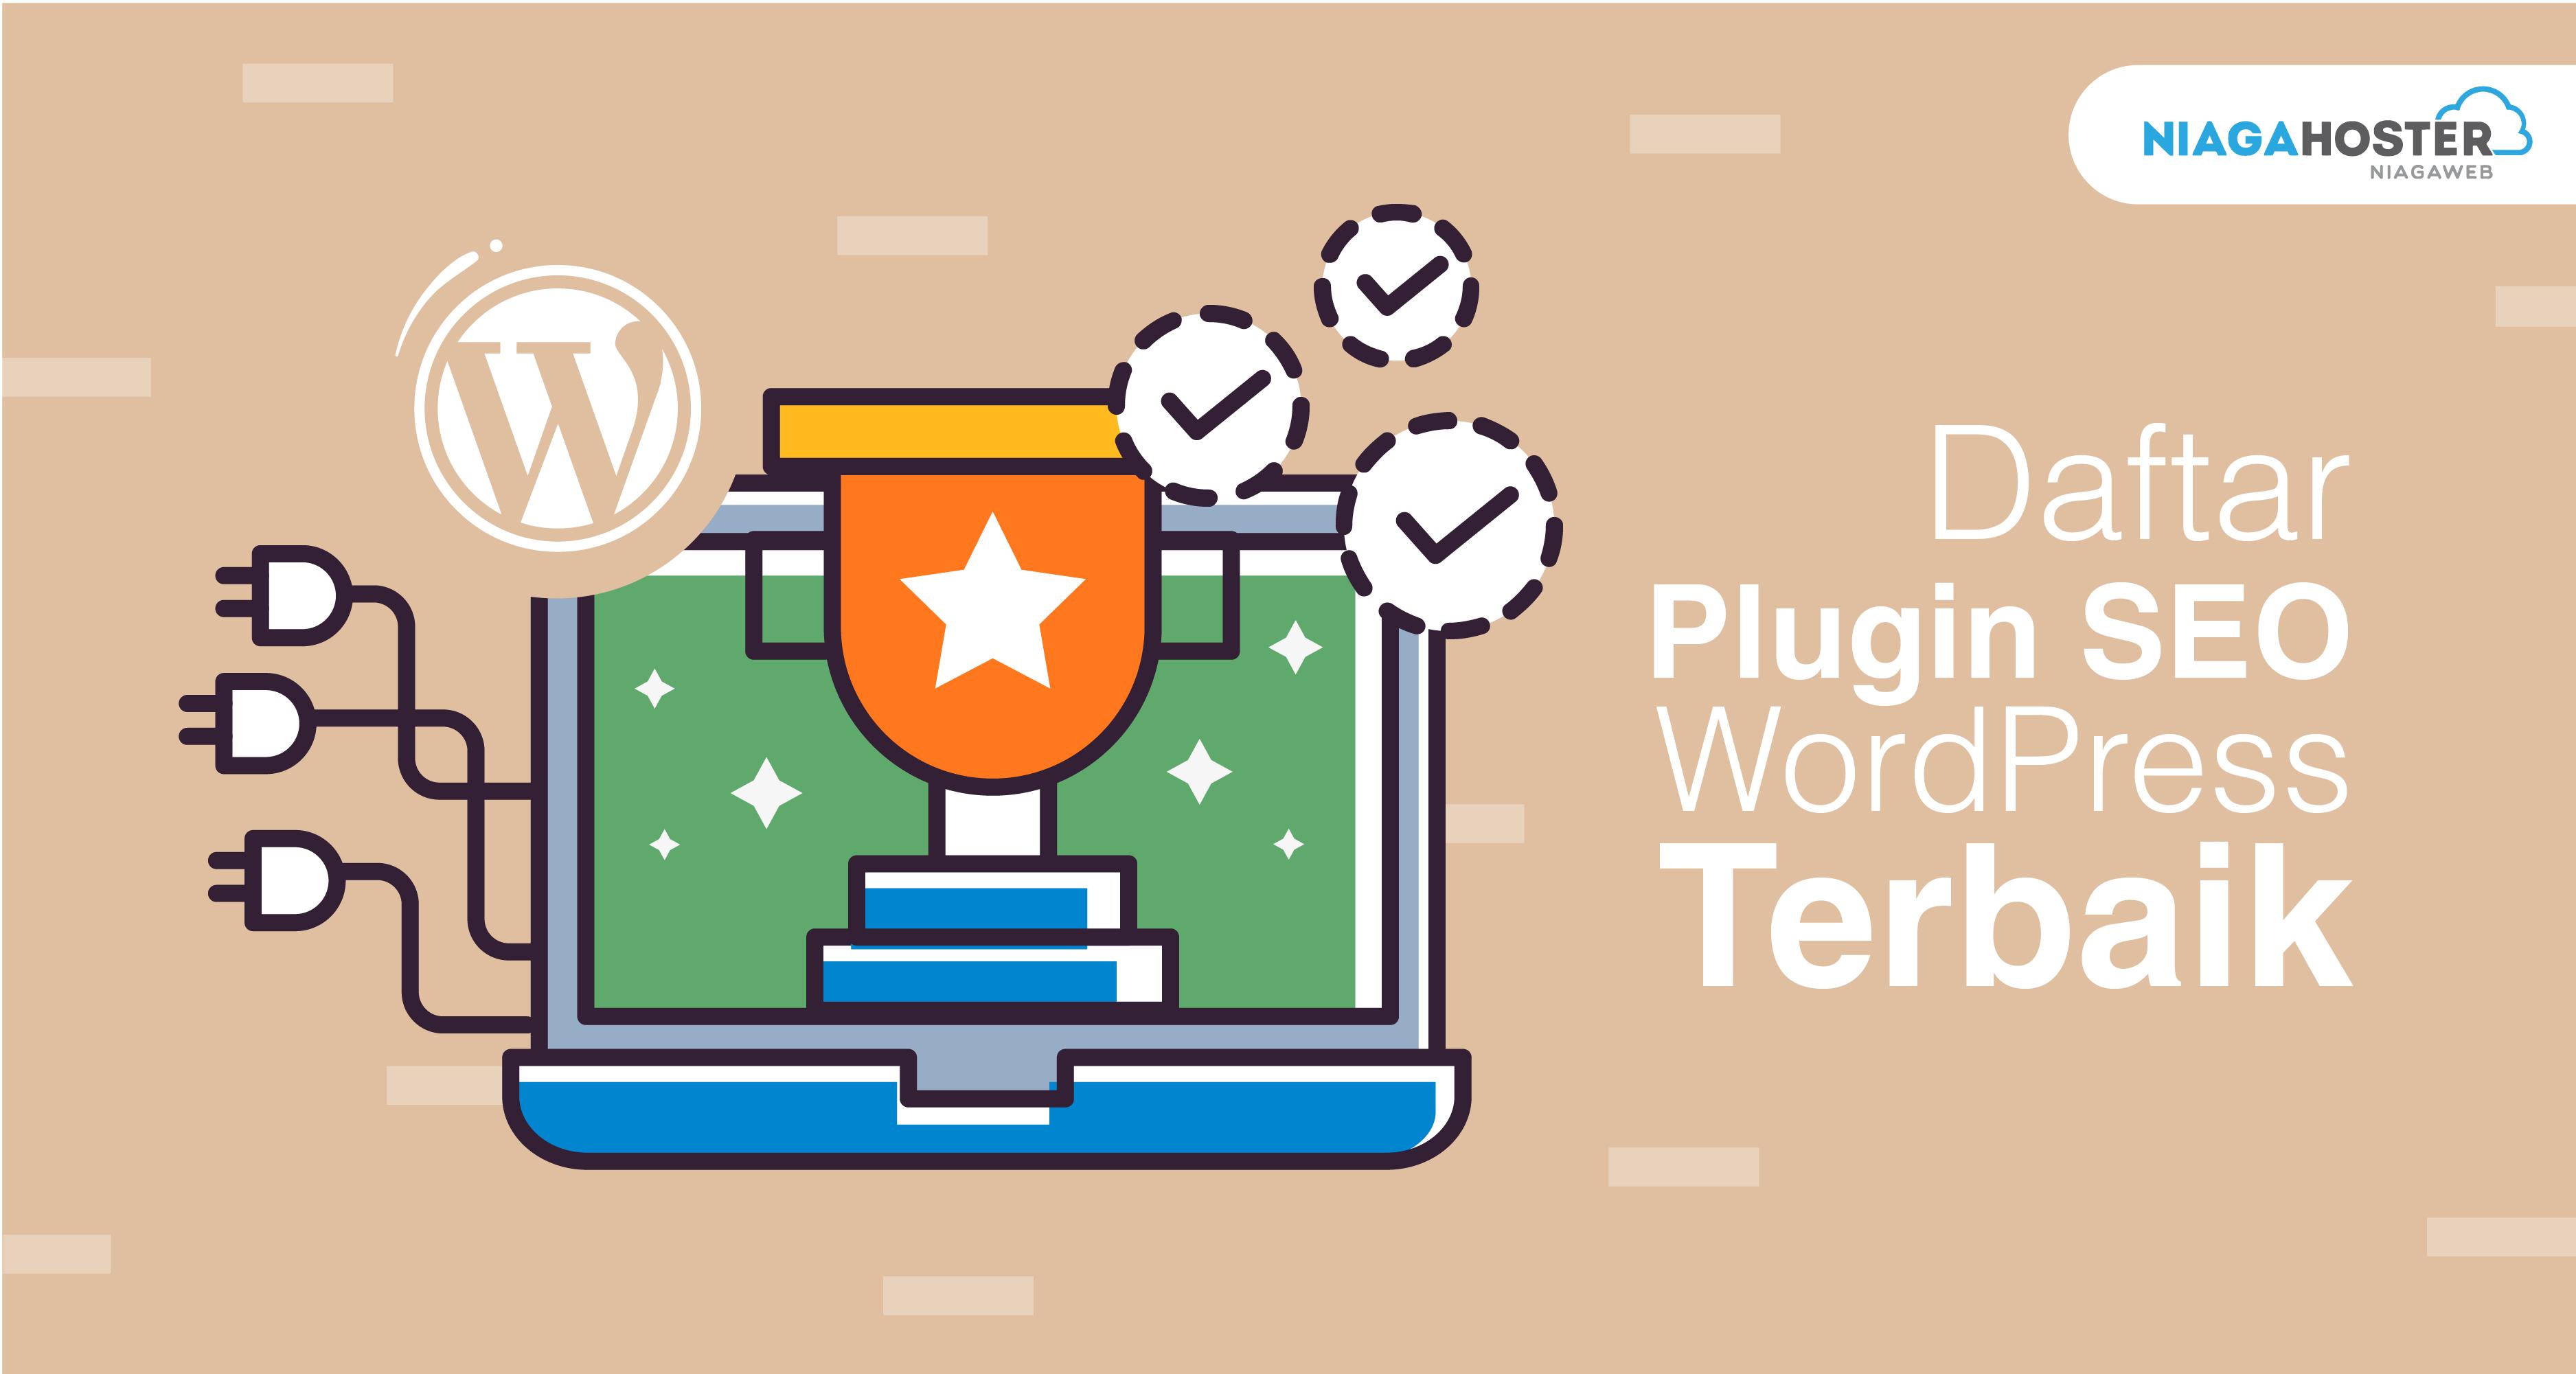 Daftar Plugin Seo WordPress Terbaik